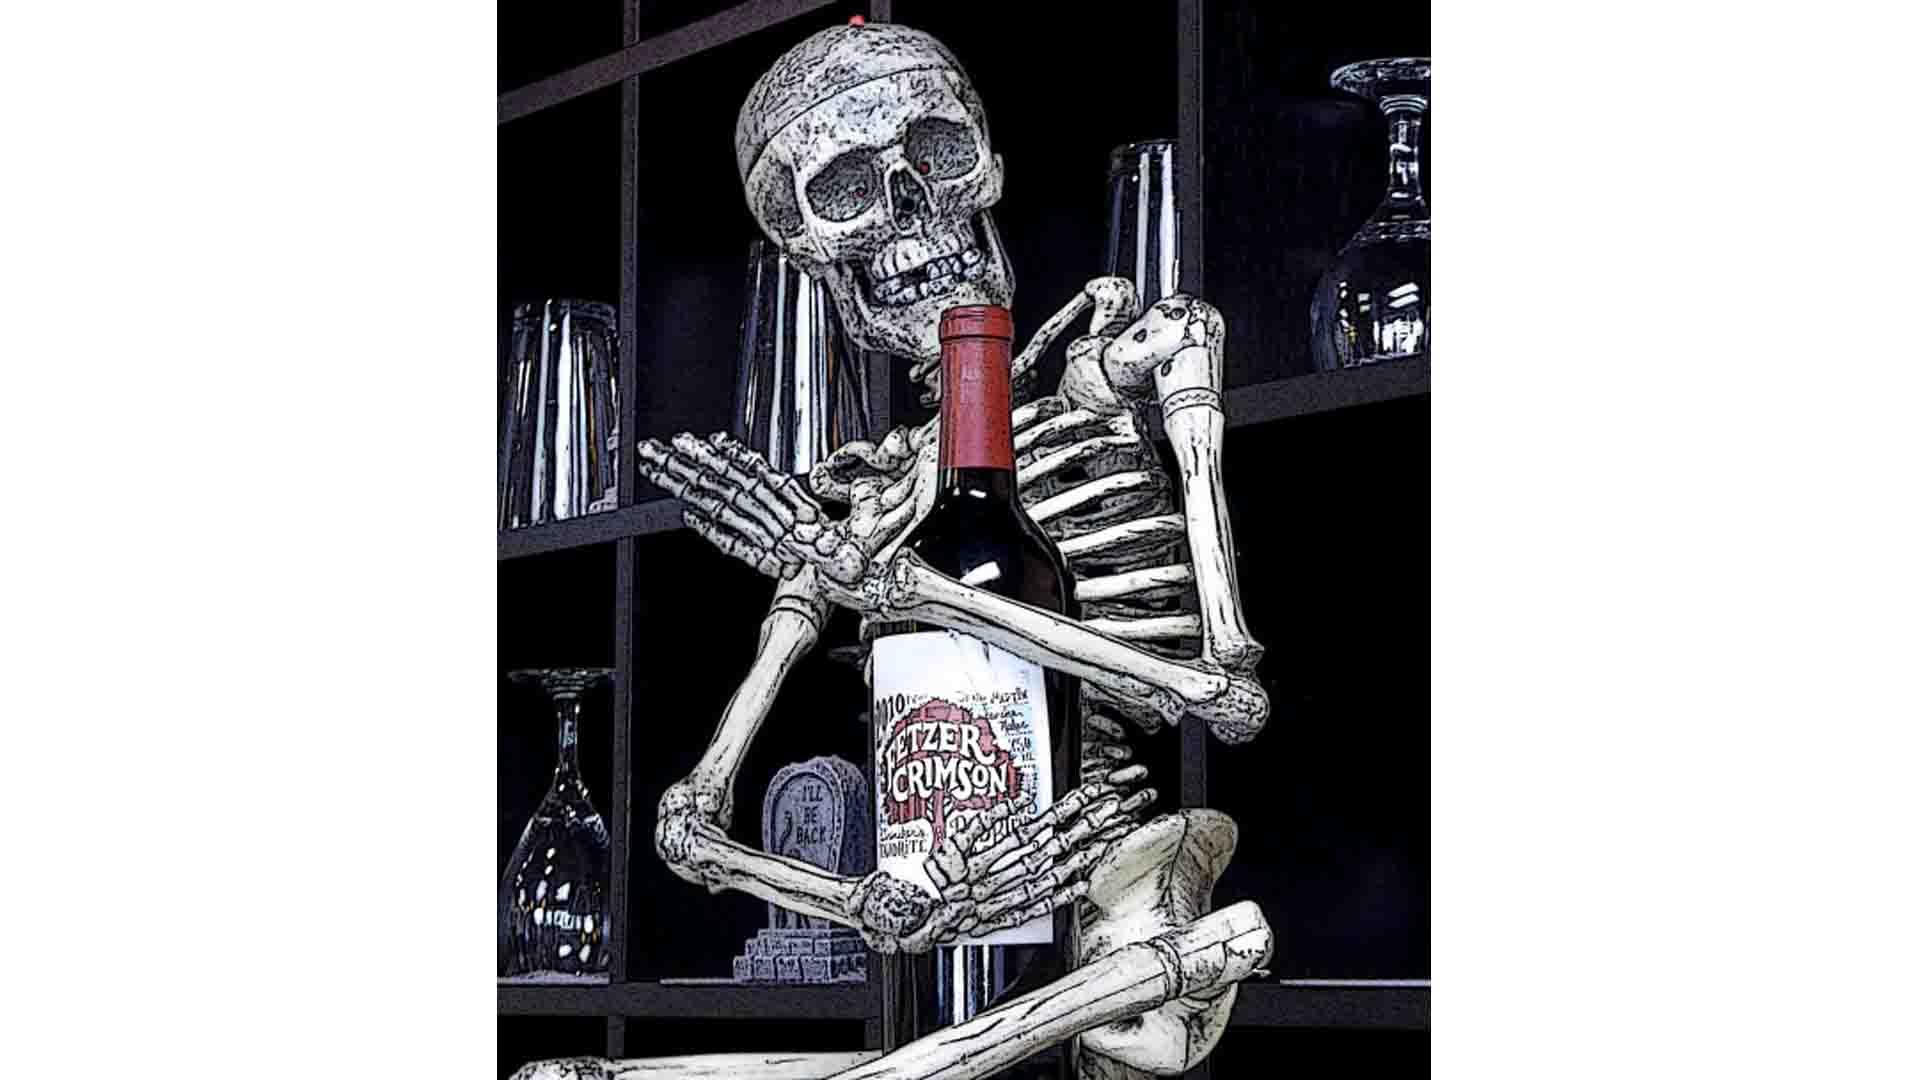 Australian Boxed Wine